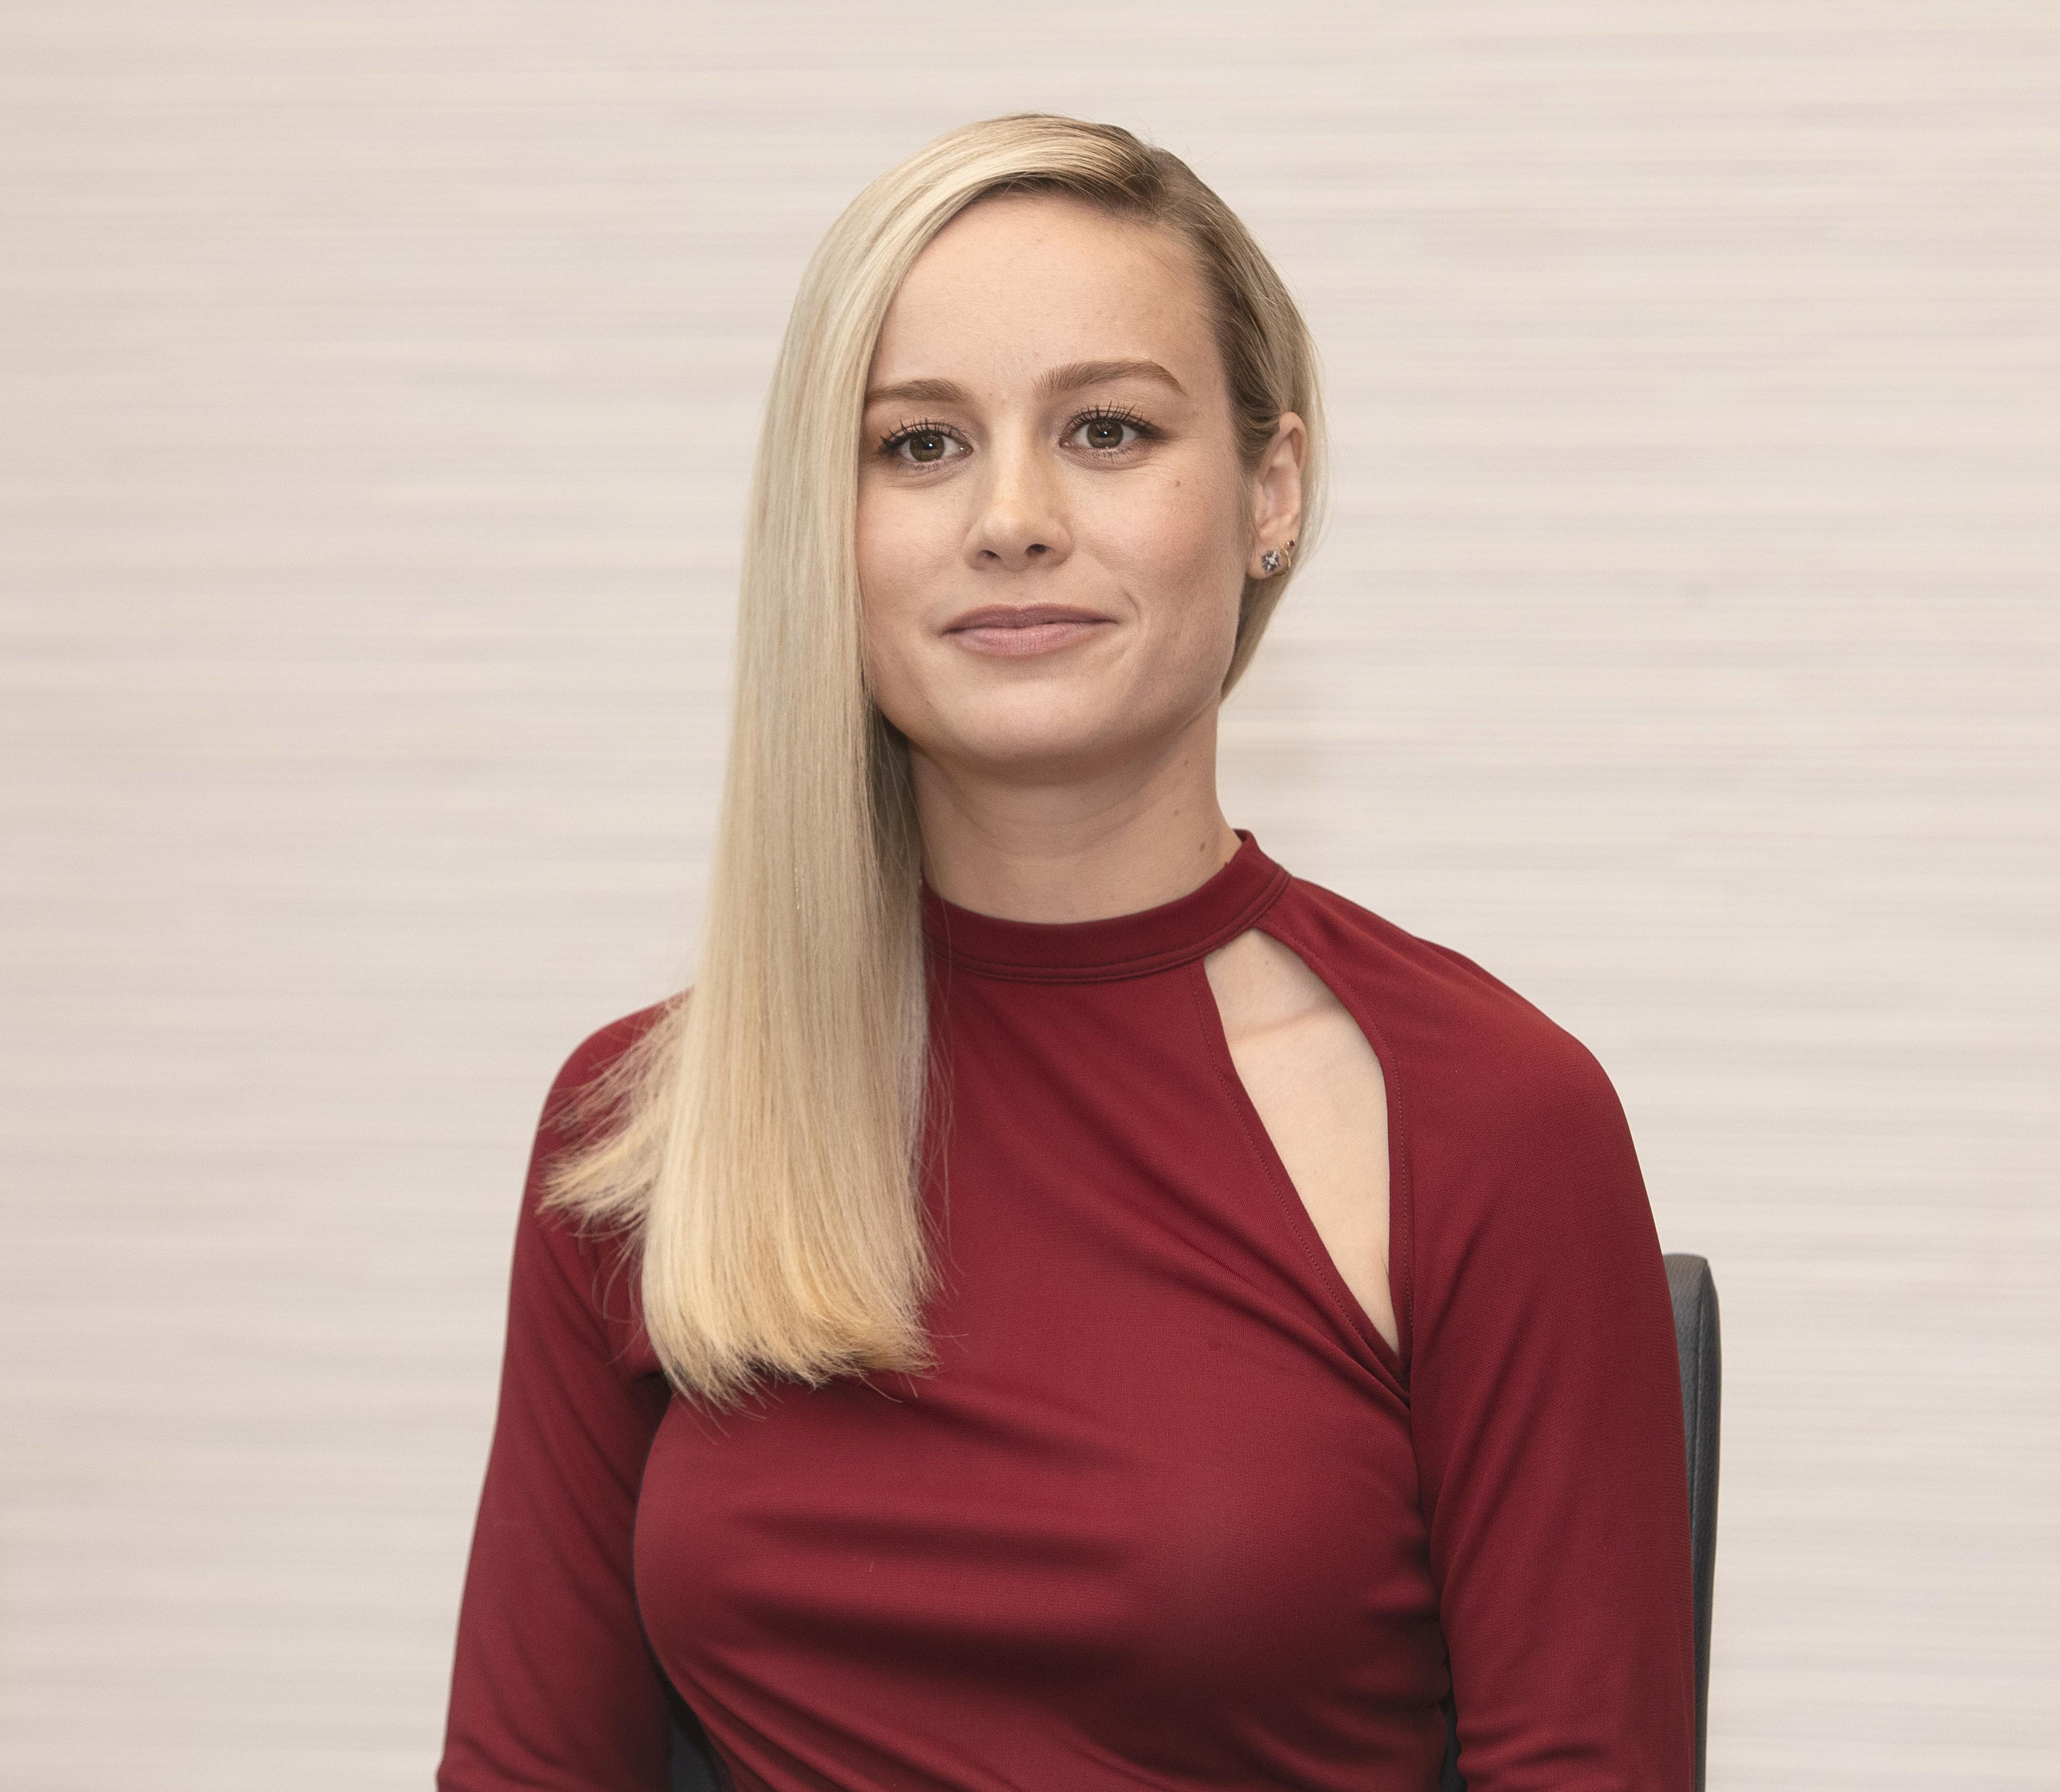 Brie Larson. Credit: PA